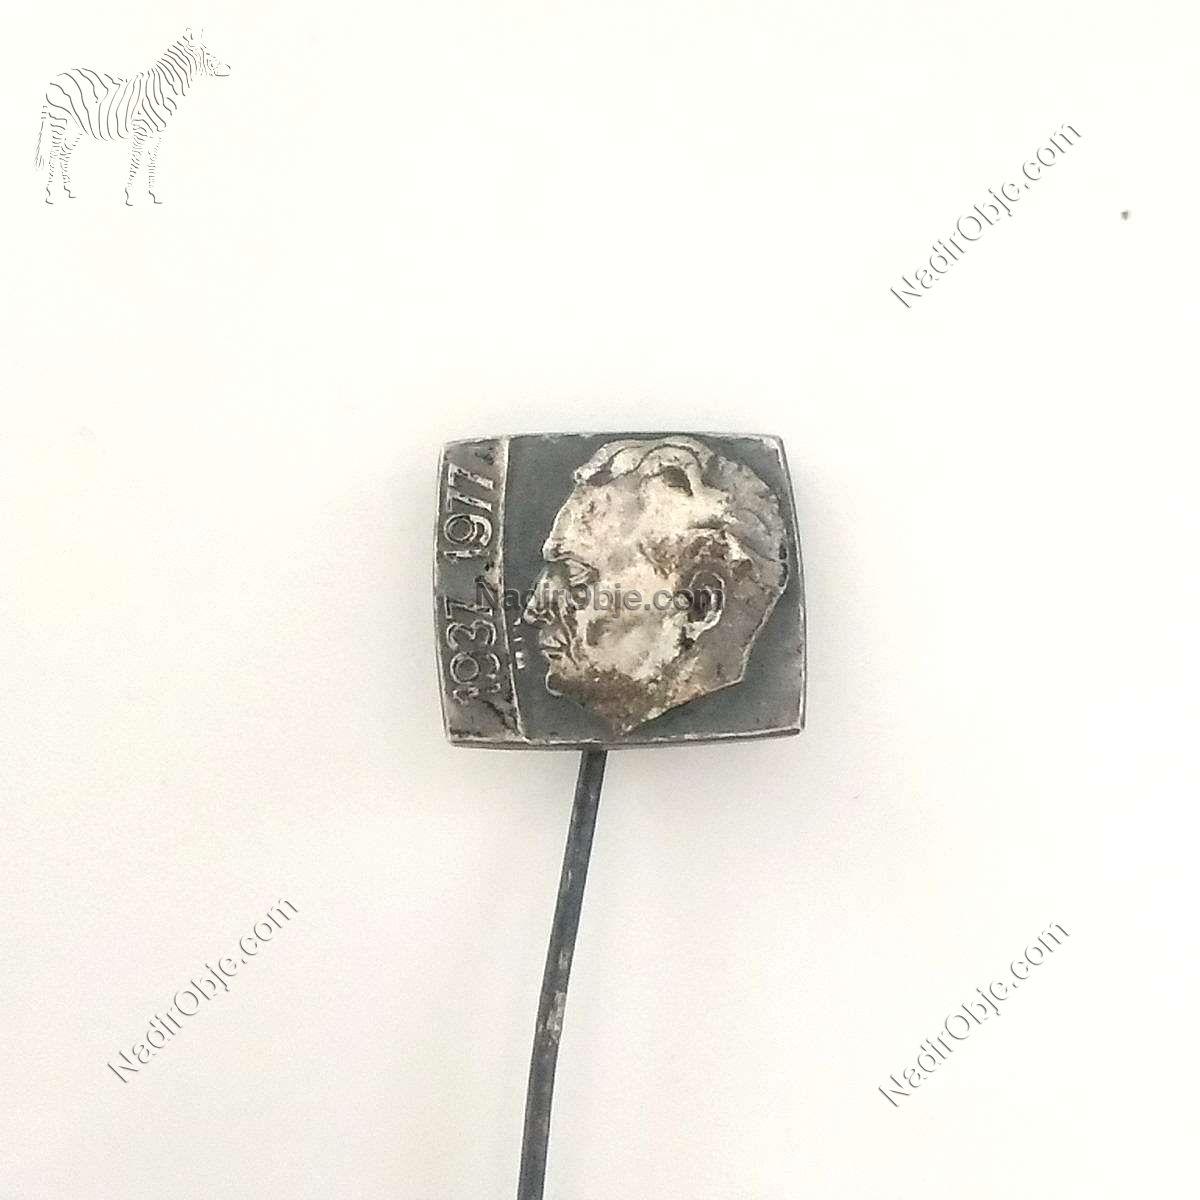 Tito Rozet – N2038 Metal Objeler Lapel Badge